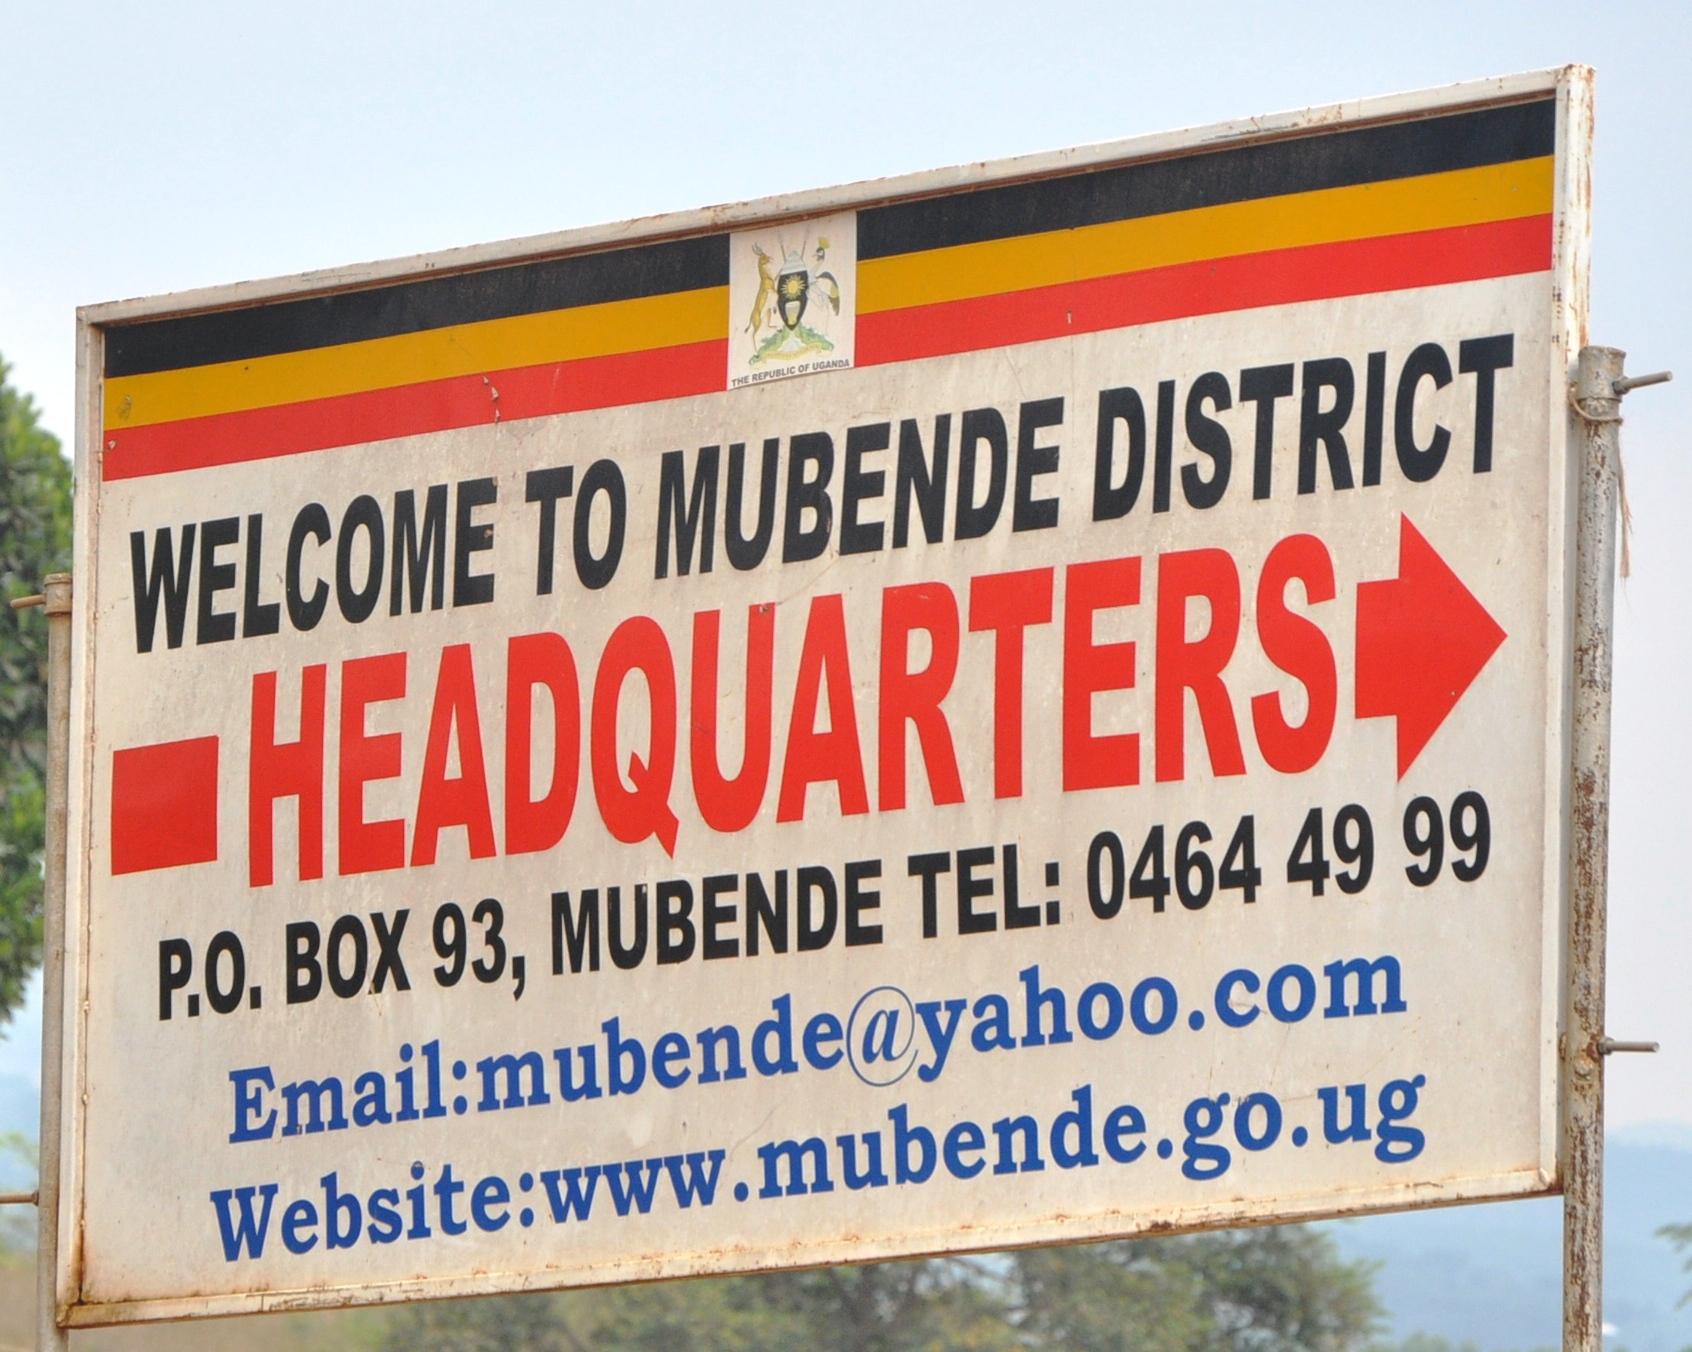 mubende district